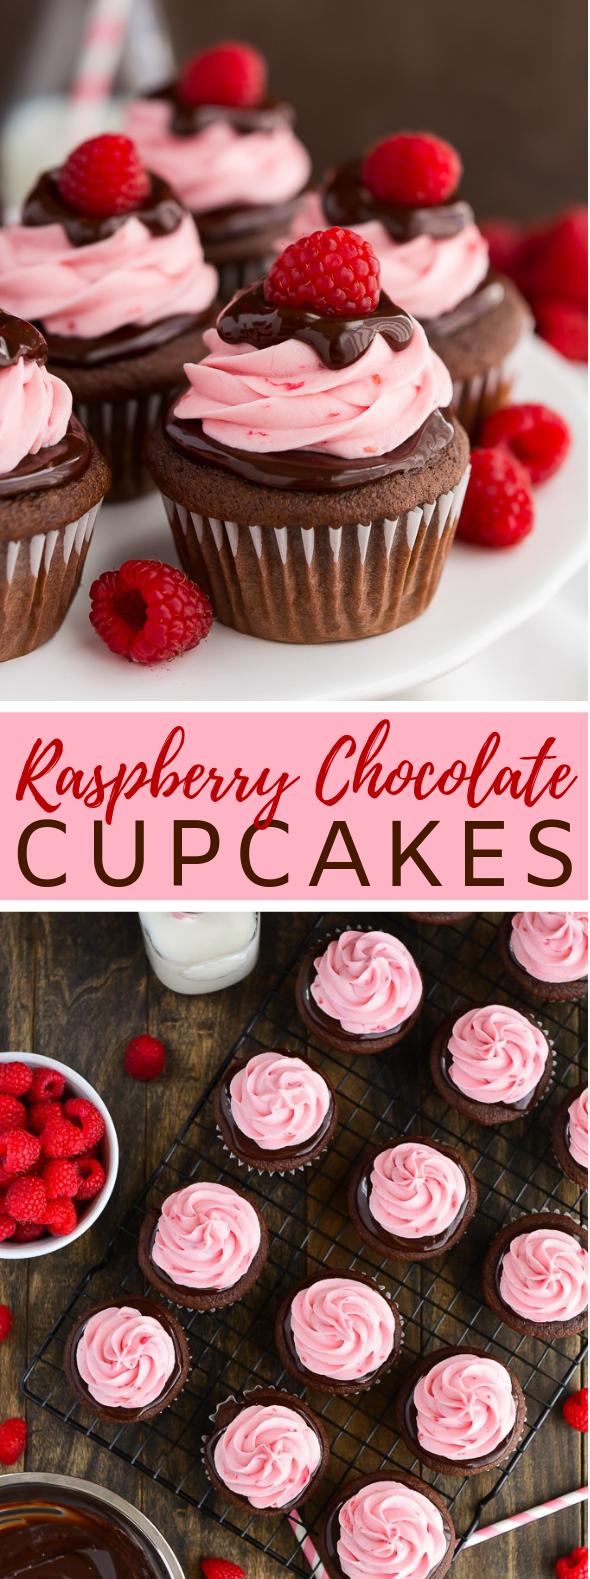 RASPBERRY CHOCOLATE CUPCAKES #dessert #cakes